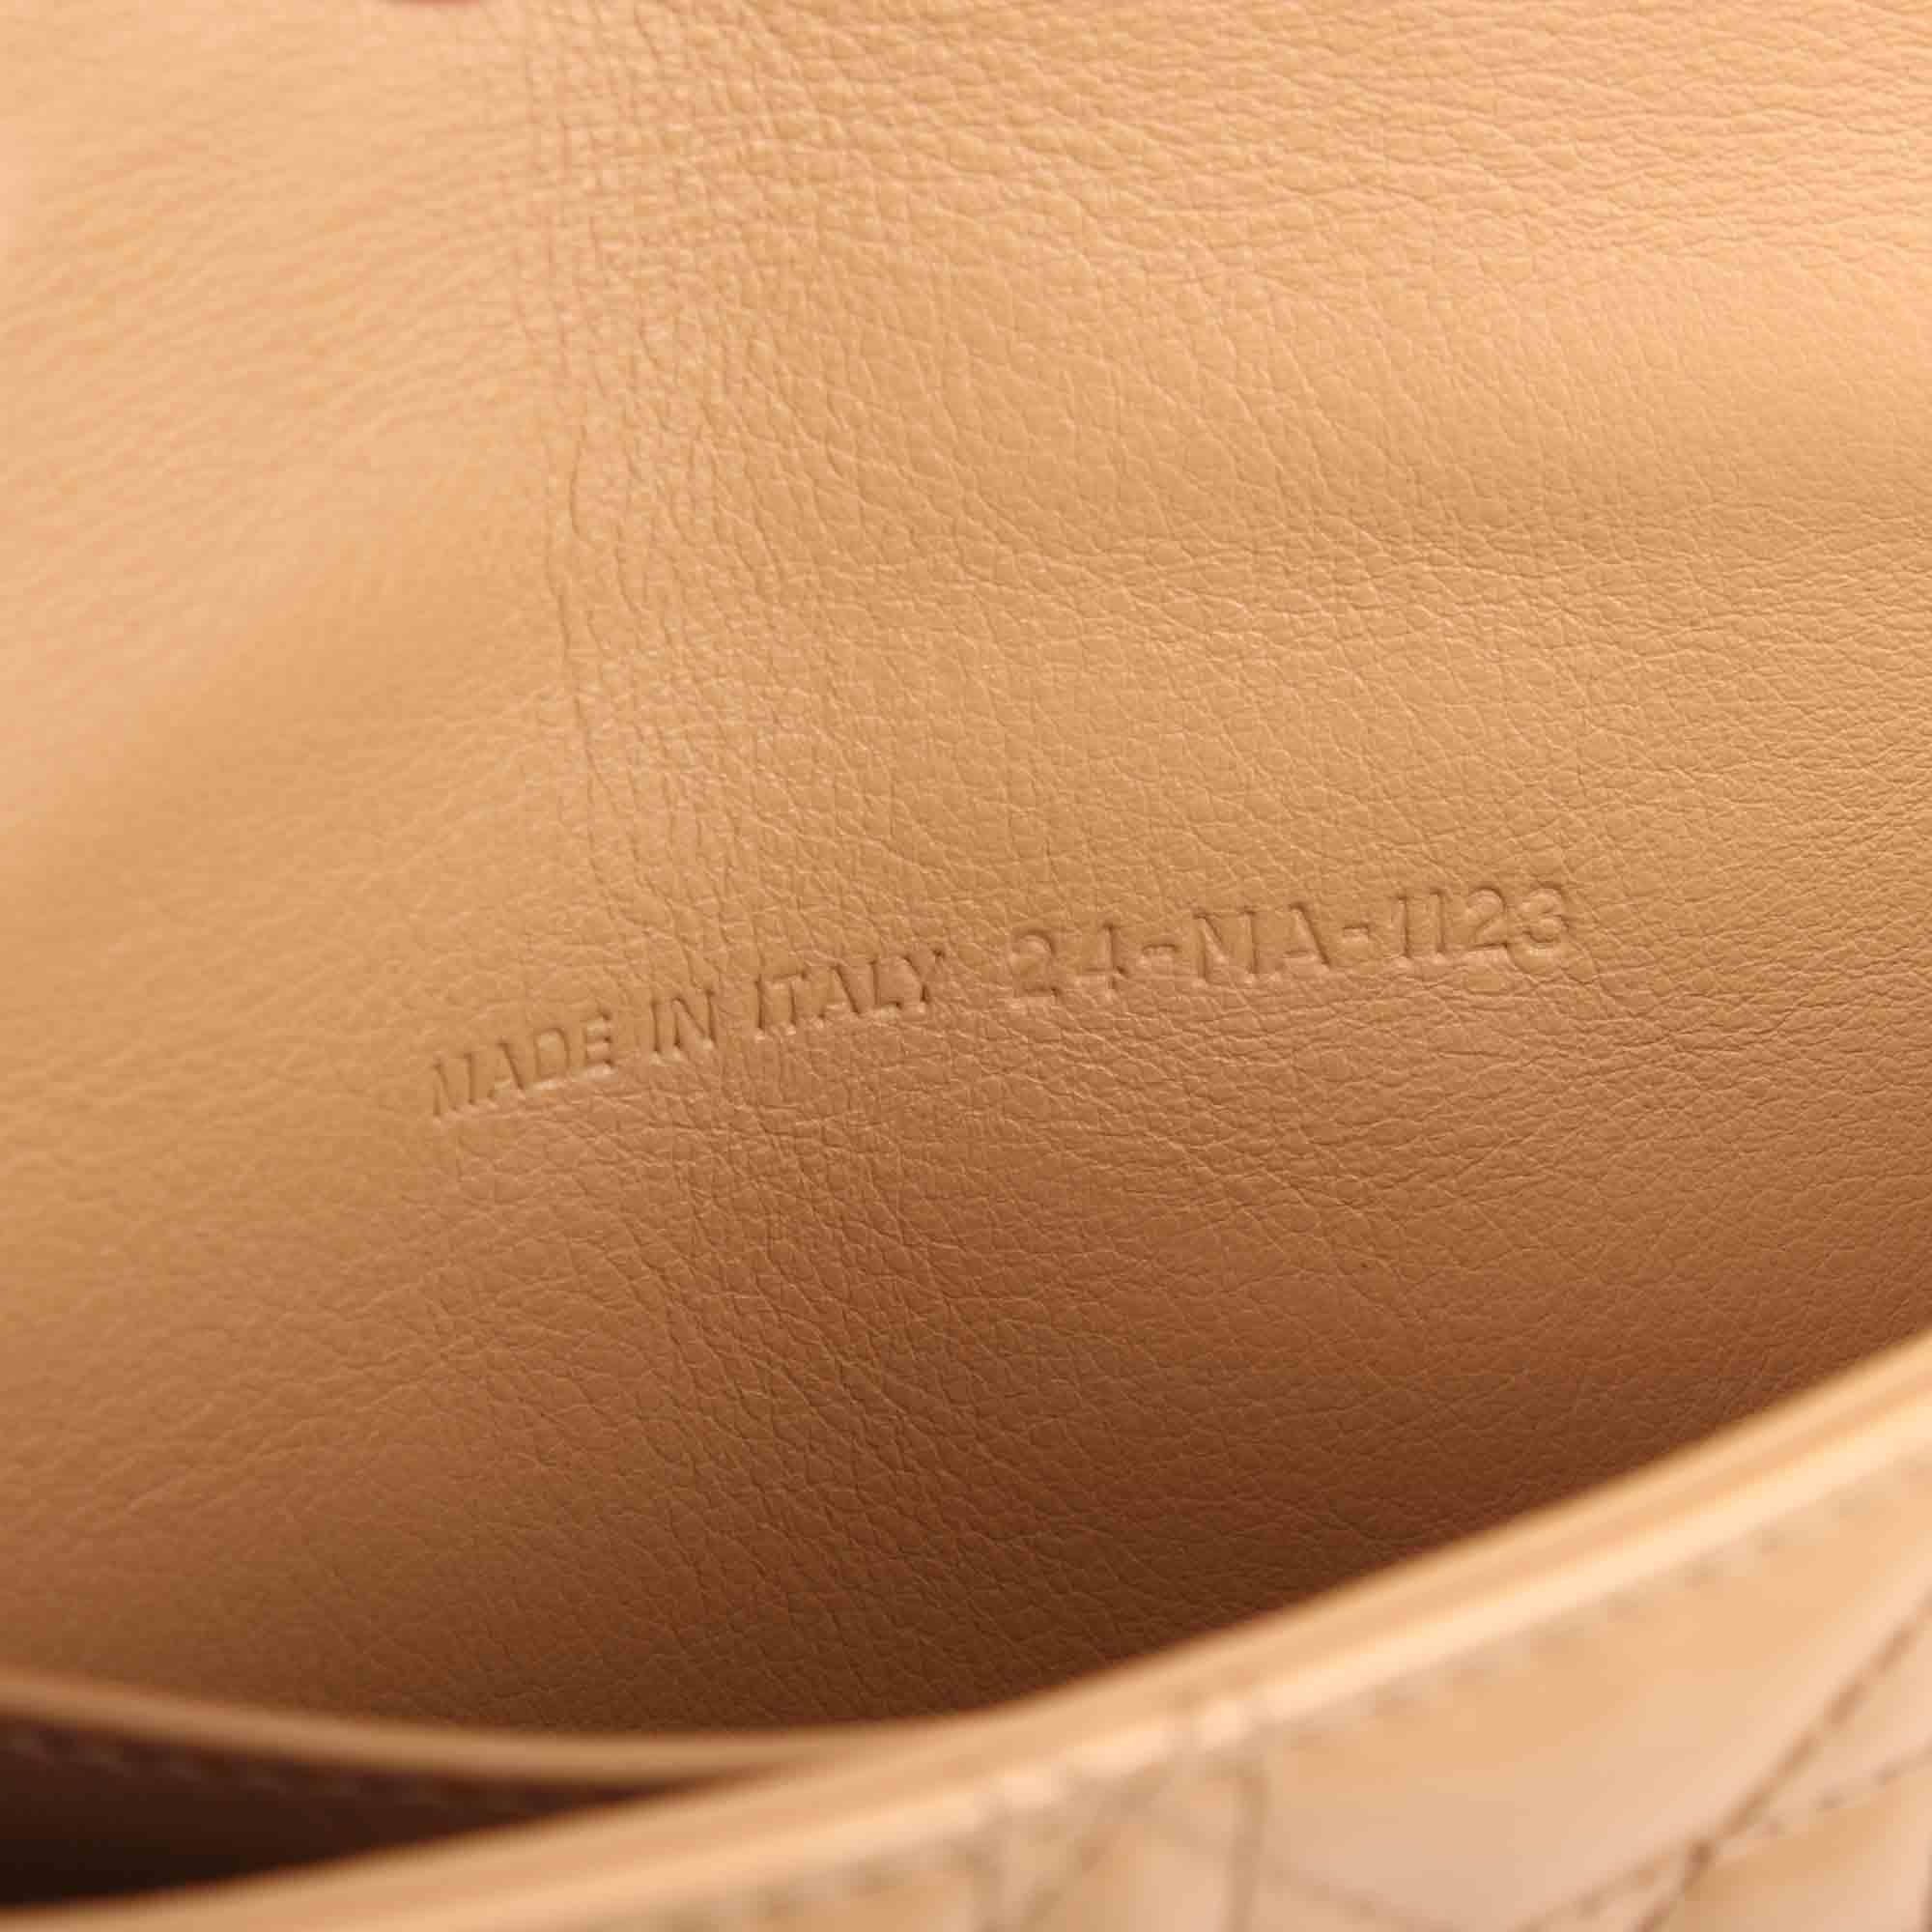 Imagen del serial del bolso miss dior new look promenade charol beige